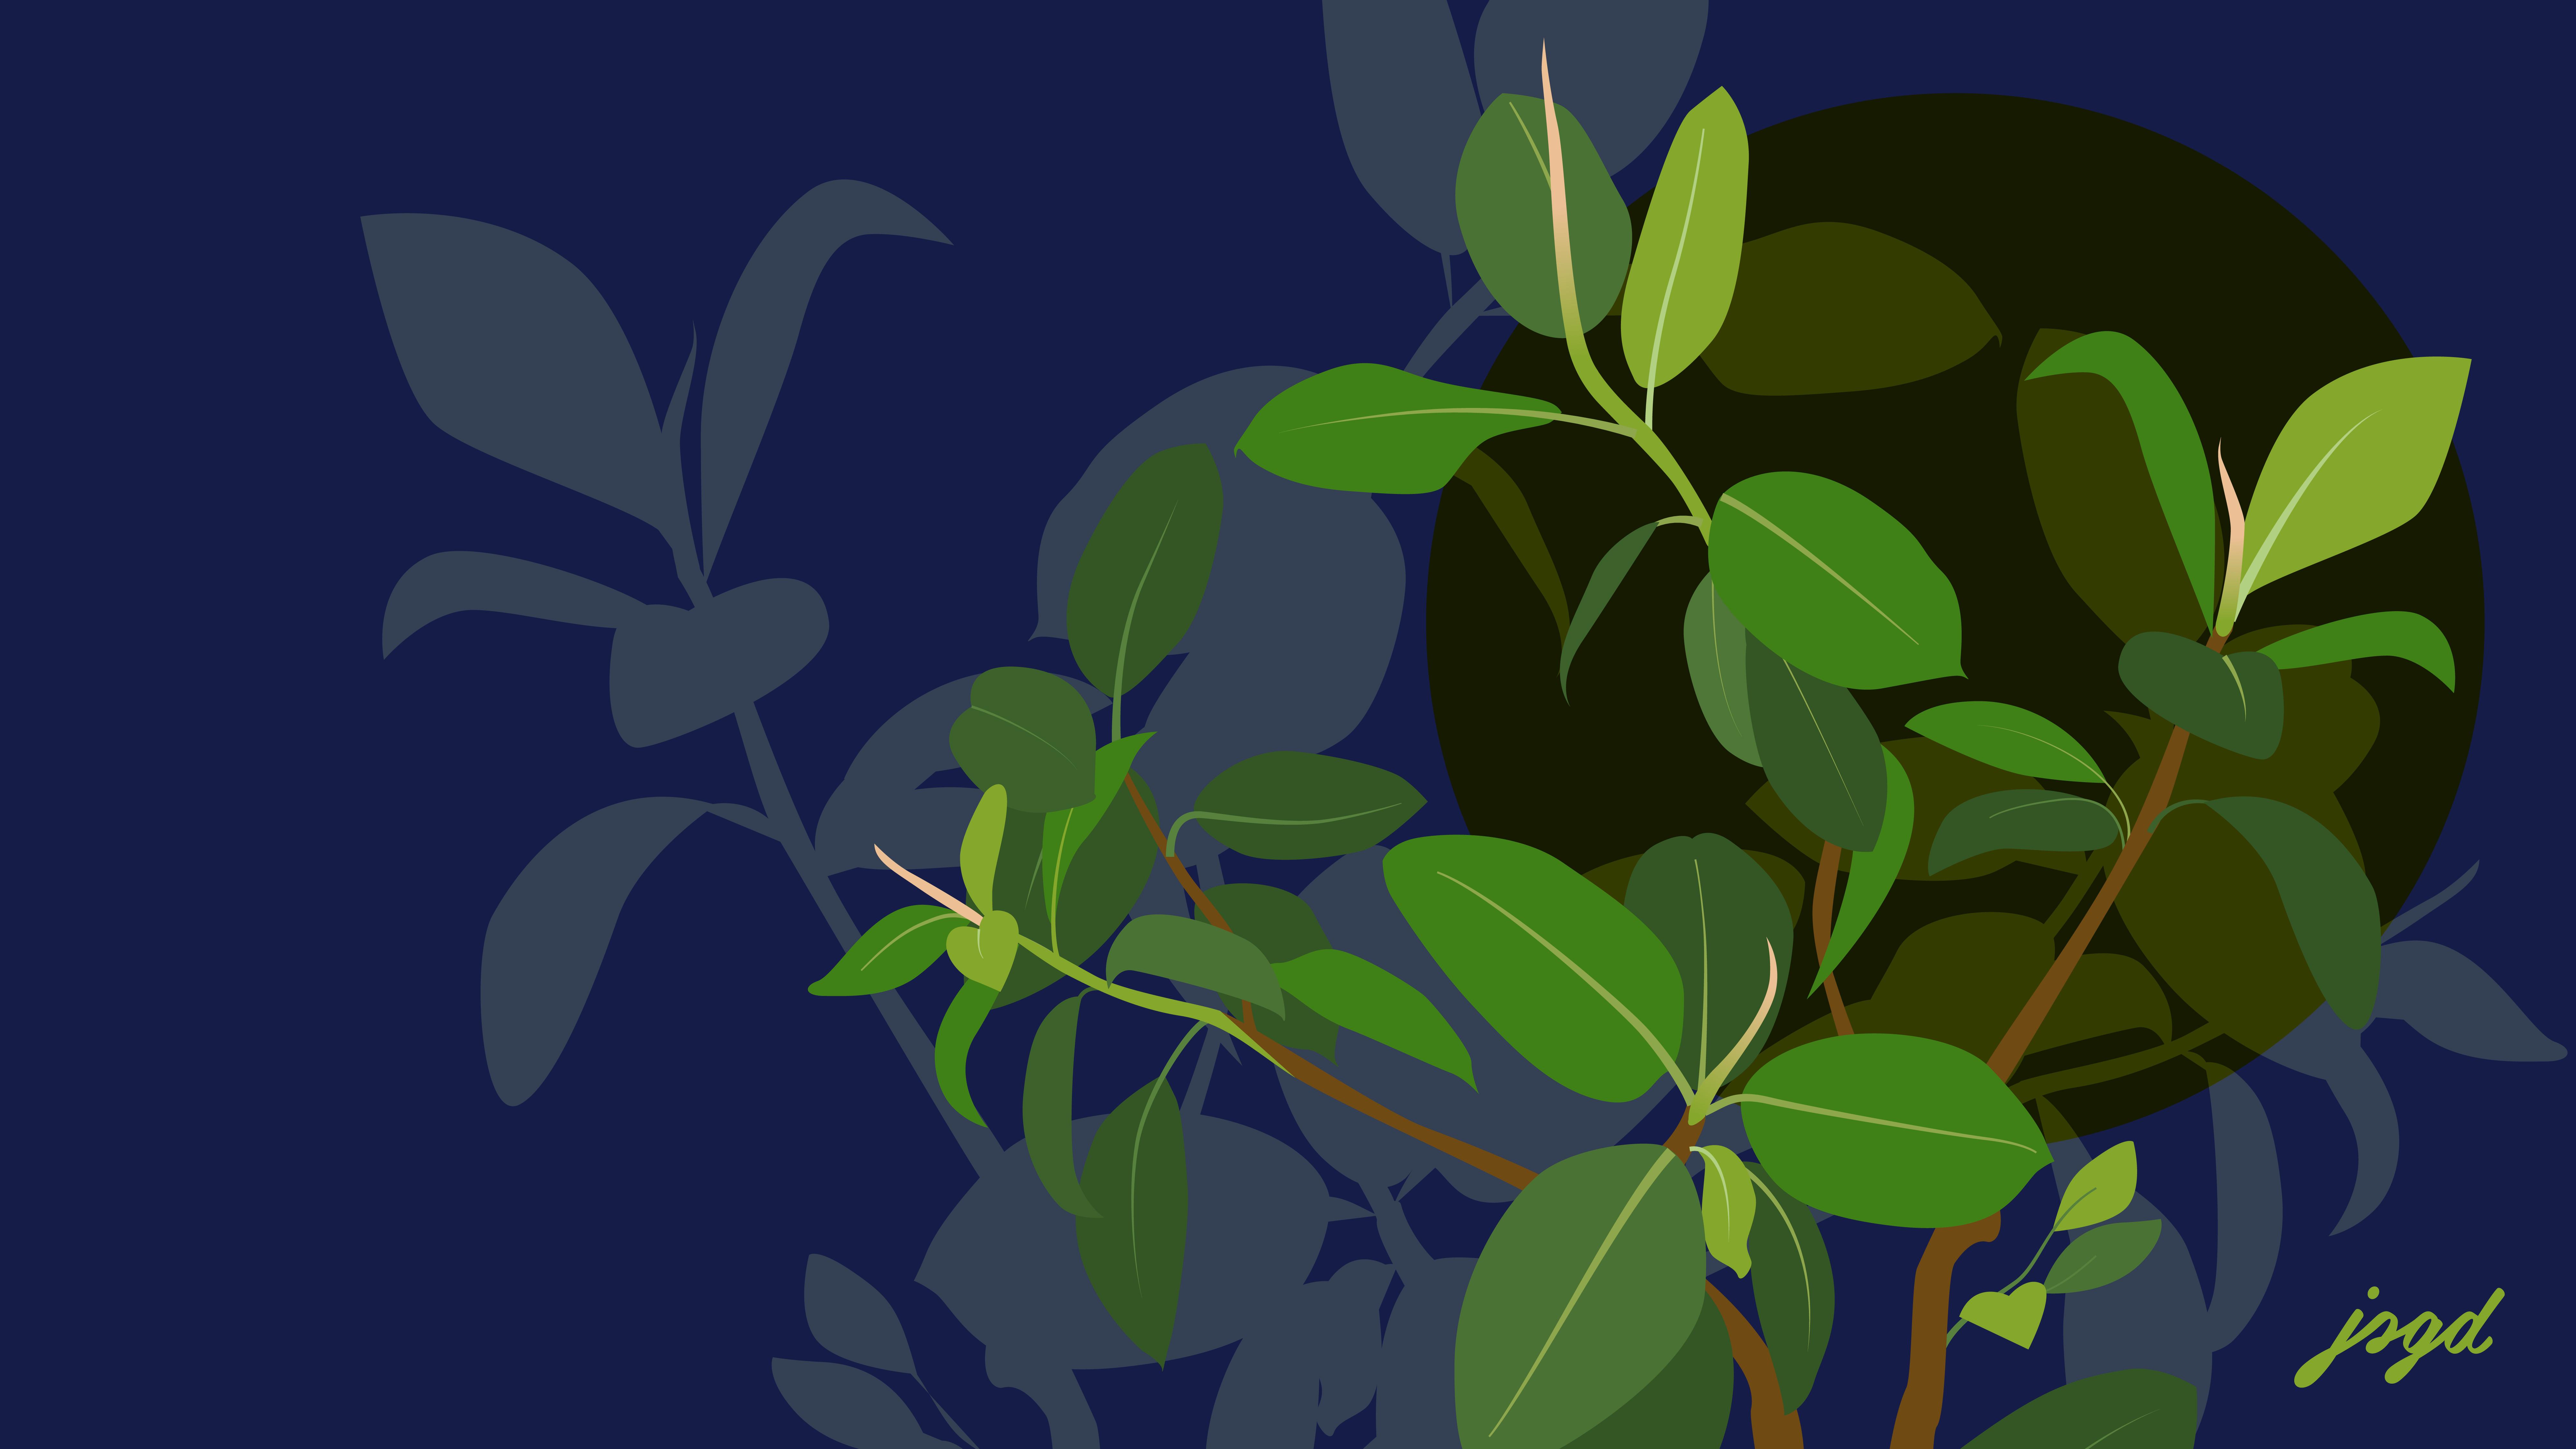 Jessica's Greenery - Wallpaper